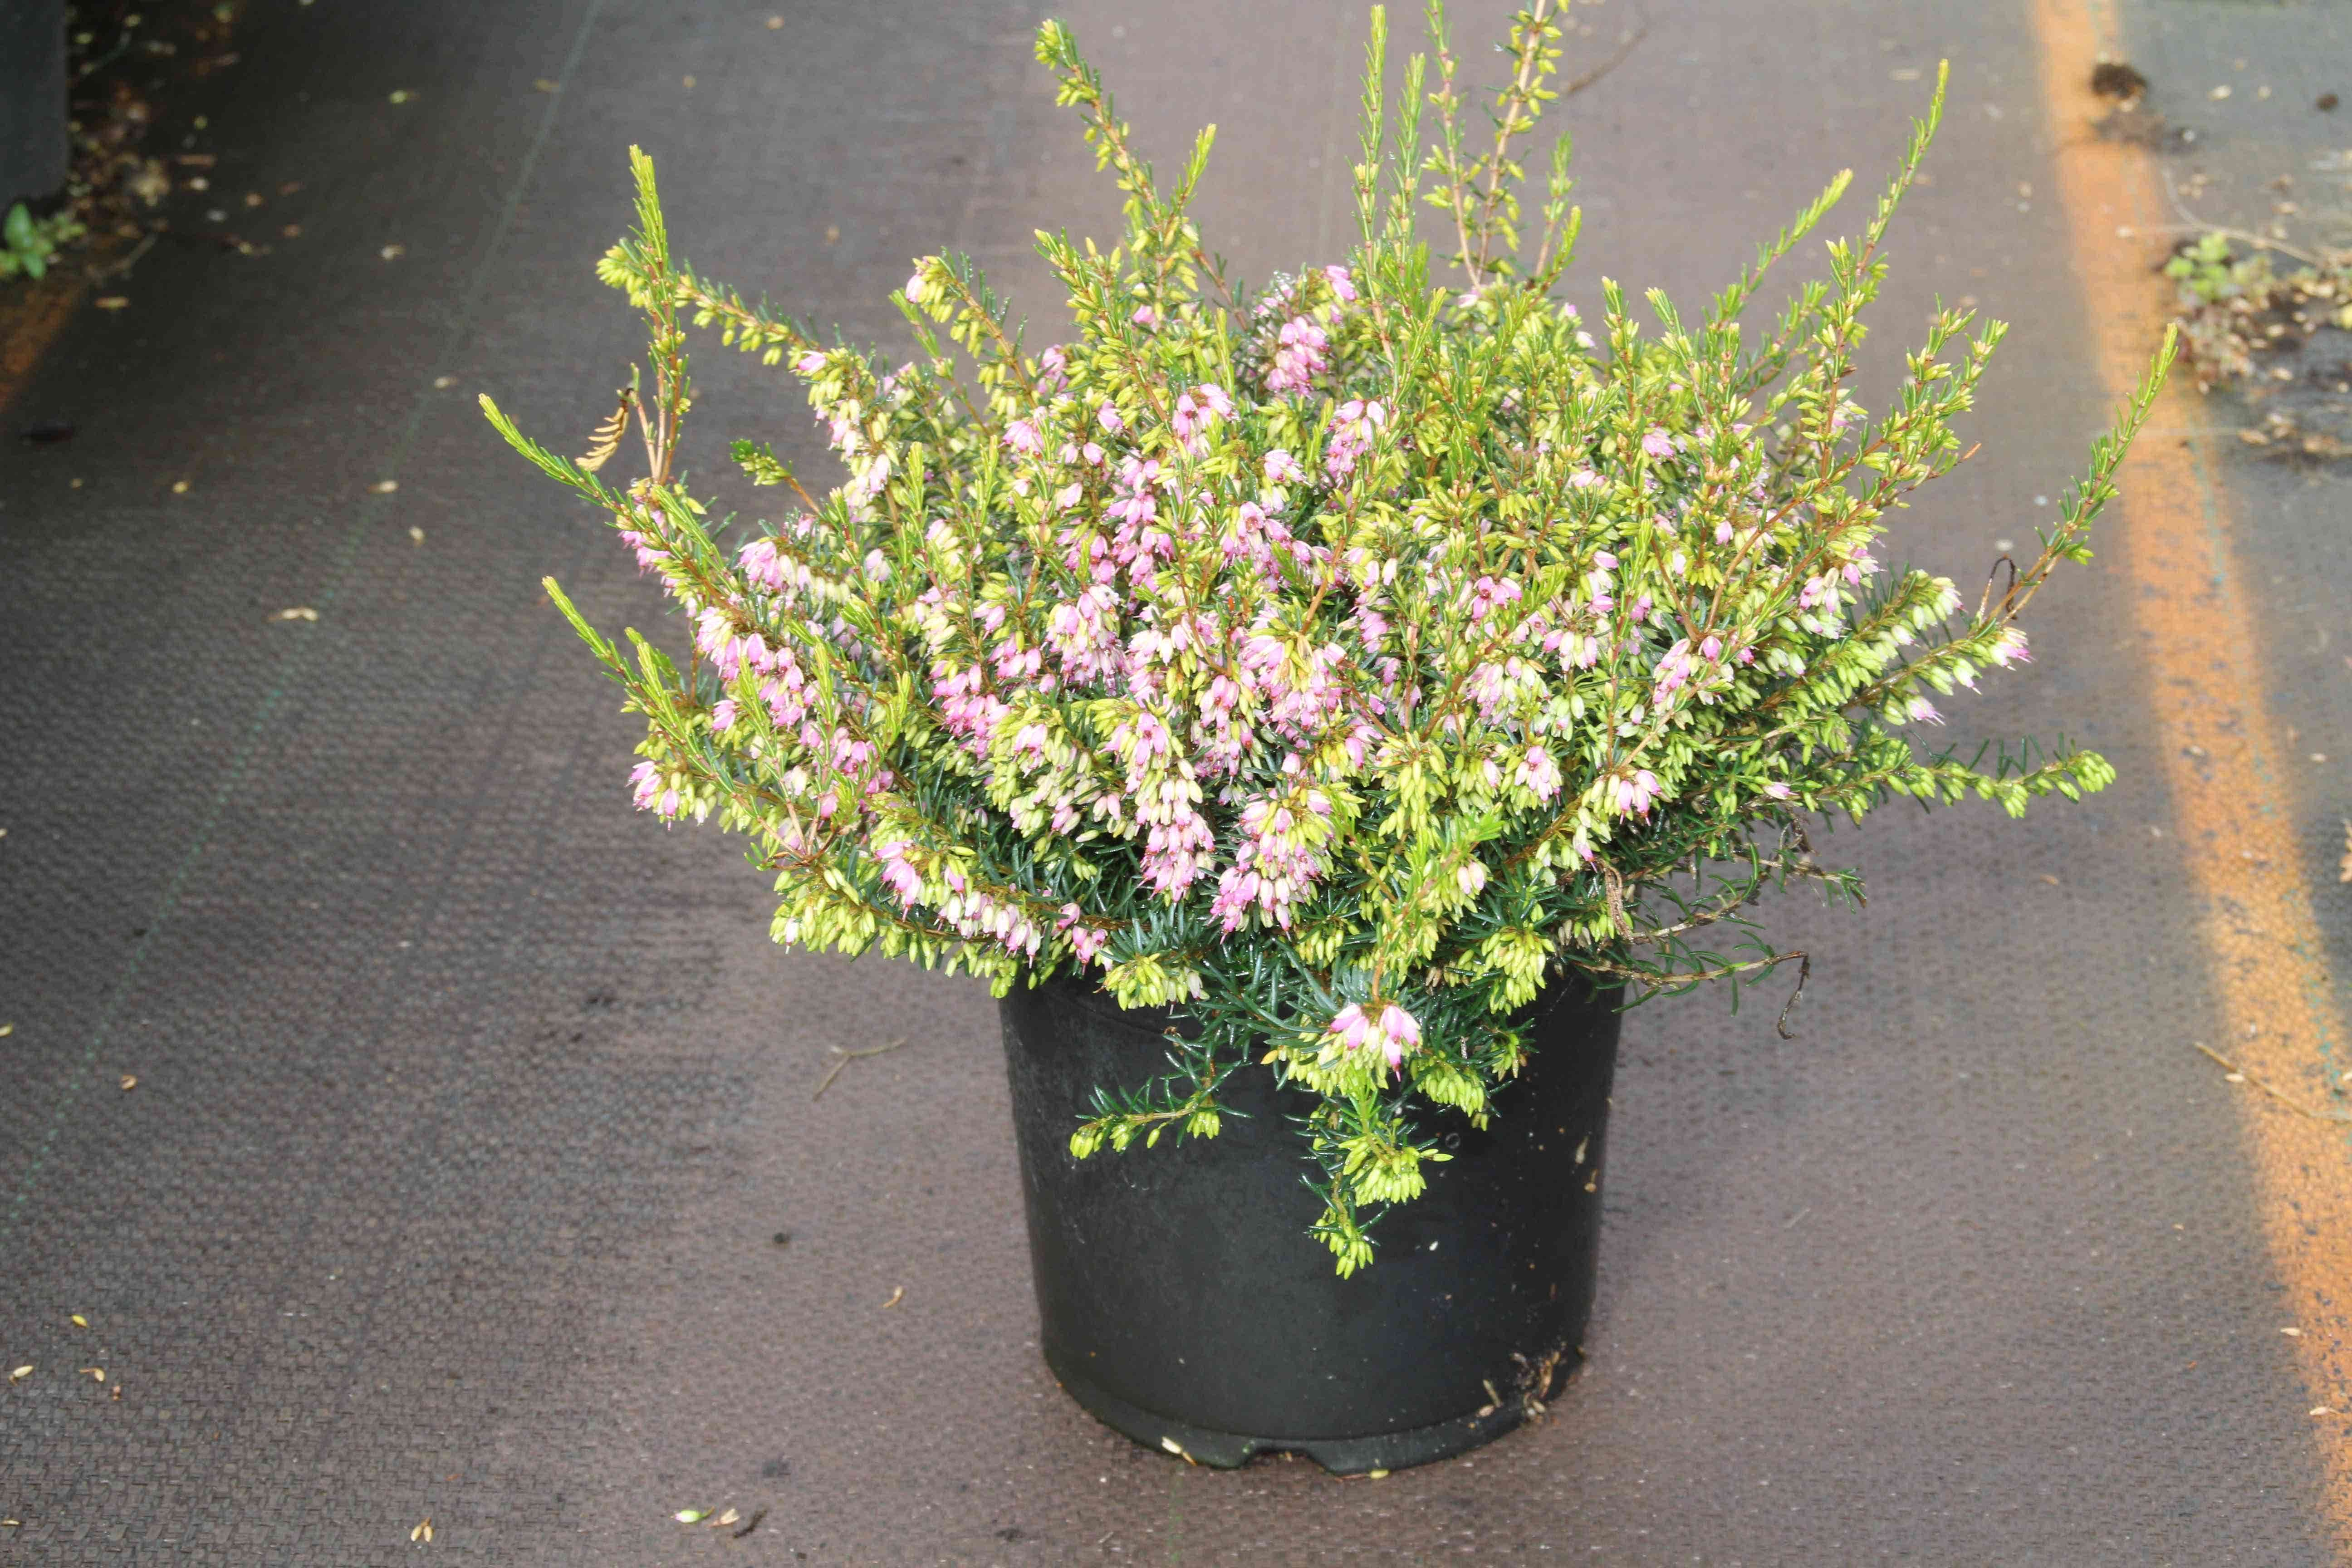 Winterheide lila-roze (Erica darleyensis 'Darley Dale') 15/20 cm